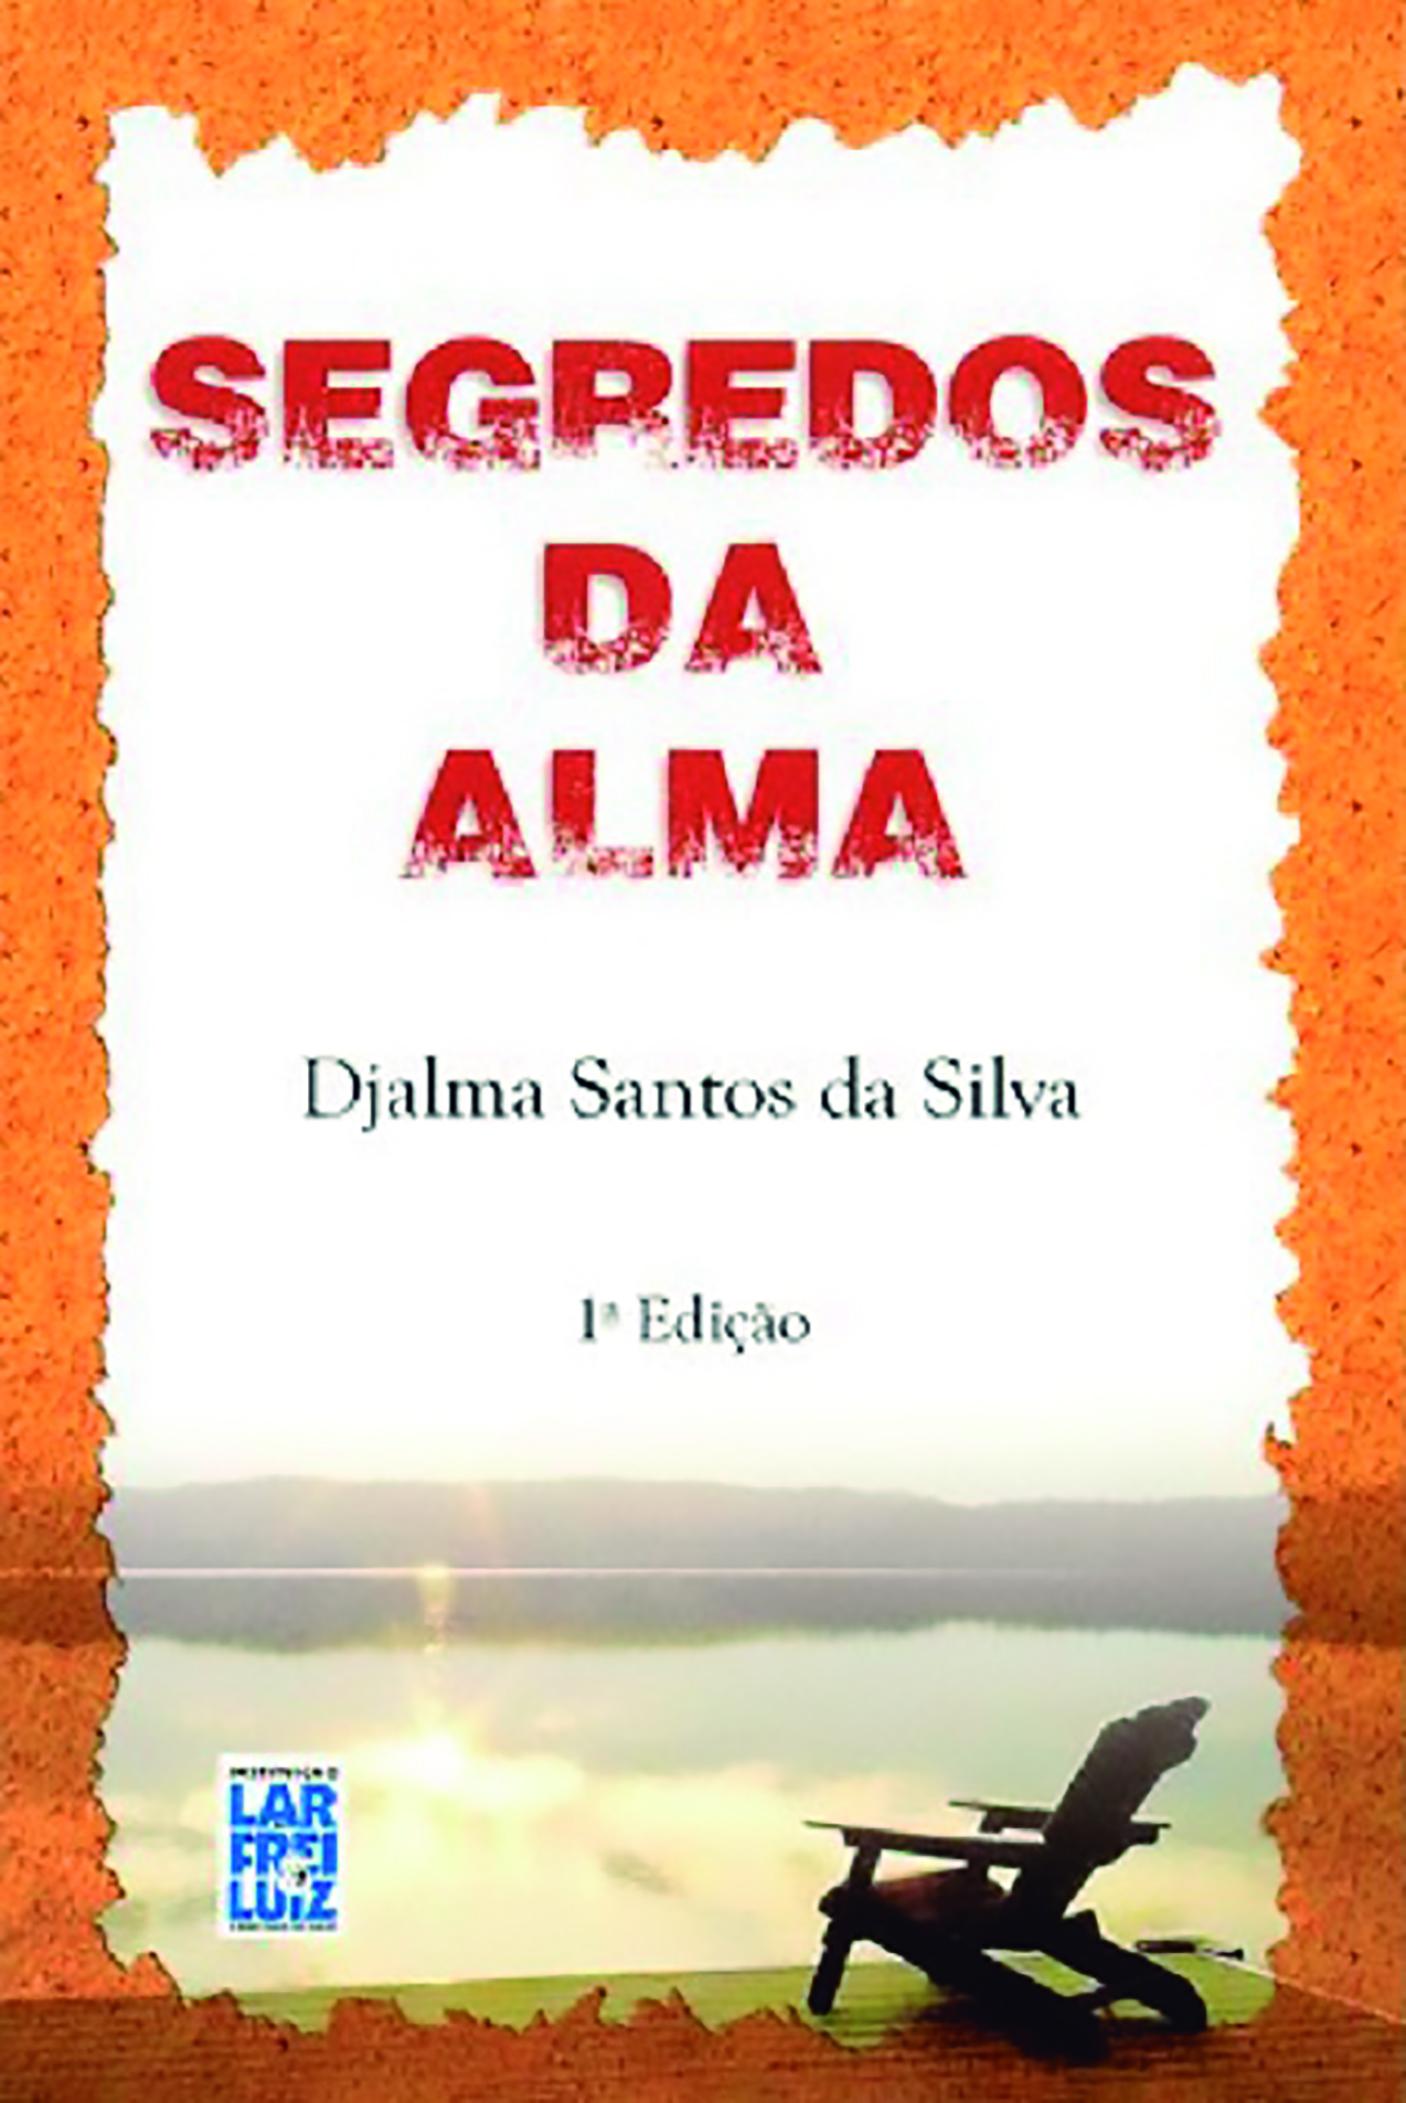 SEGREDOS DA ALMA - FREI